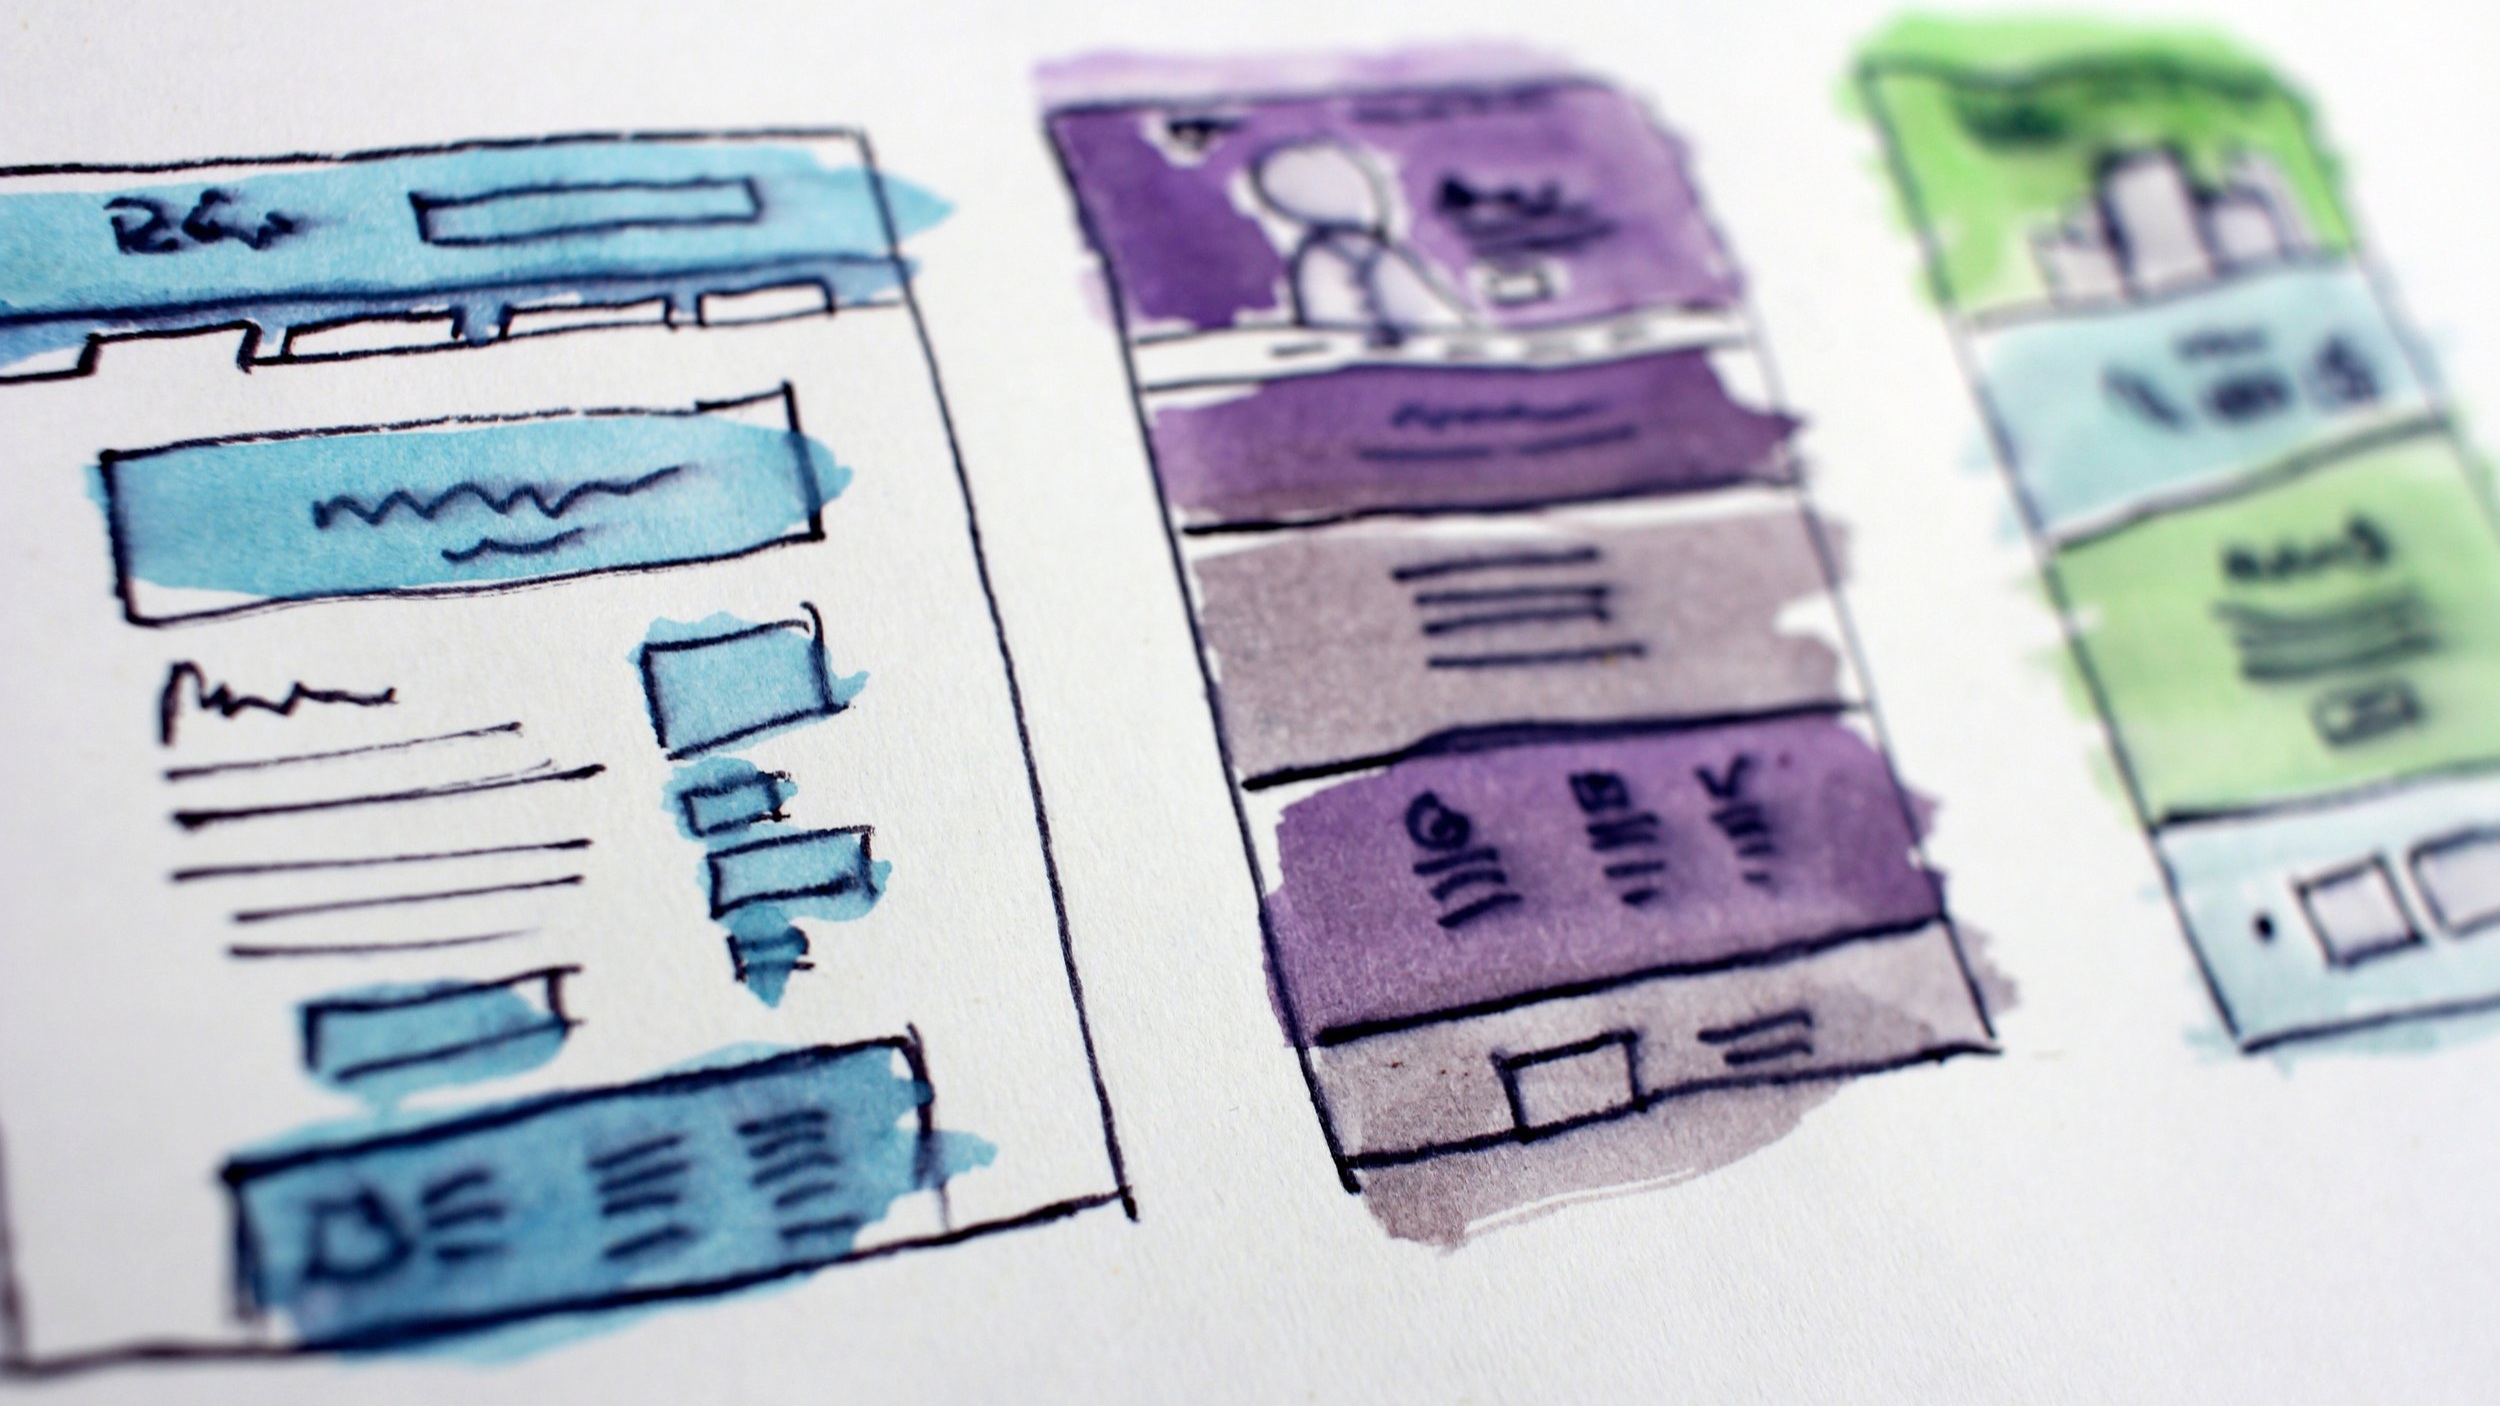 Web design - Beautiful & Effective